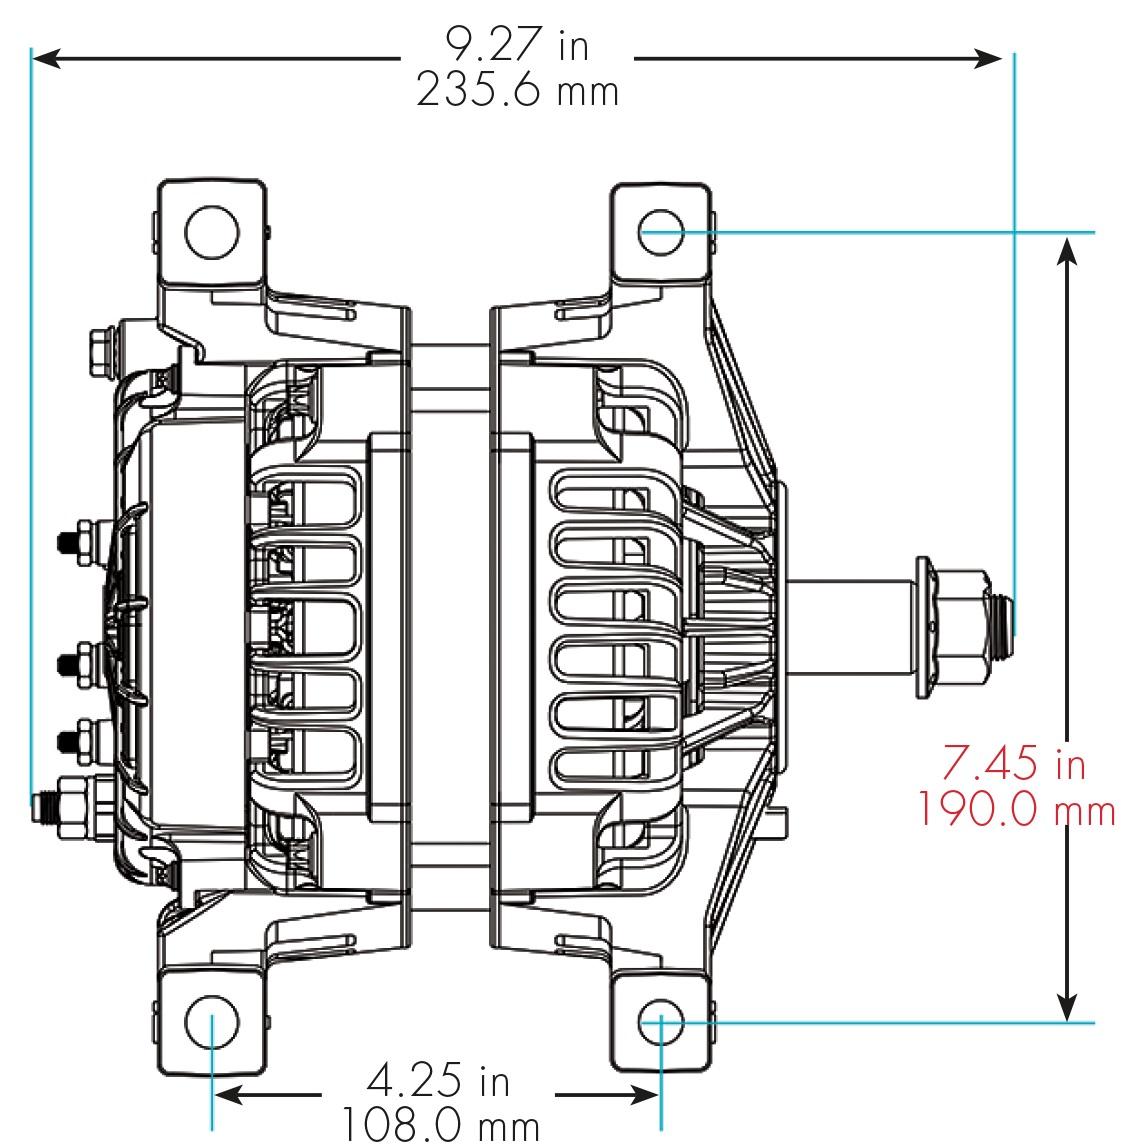 Acdelco 27si Alternator Wiring Diagram Delco Remy